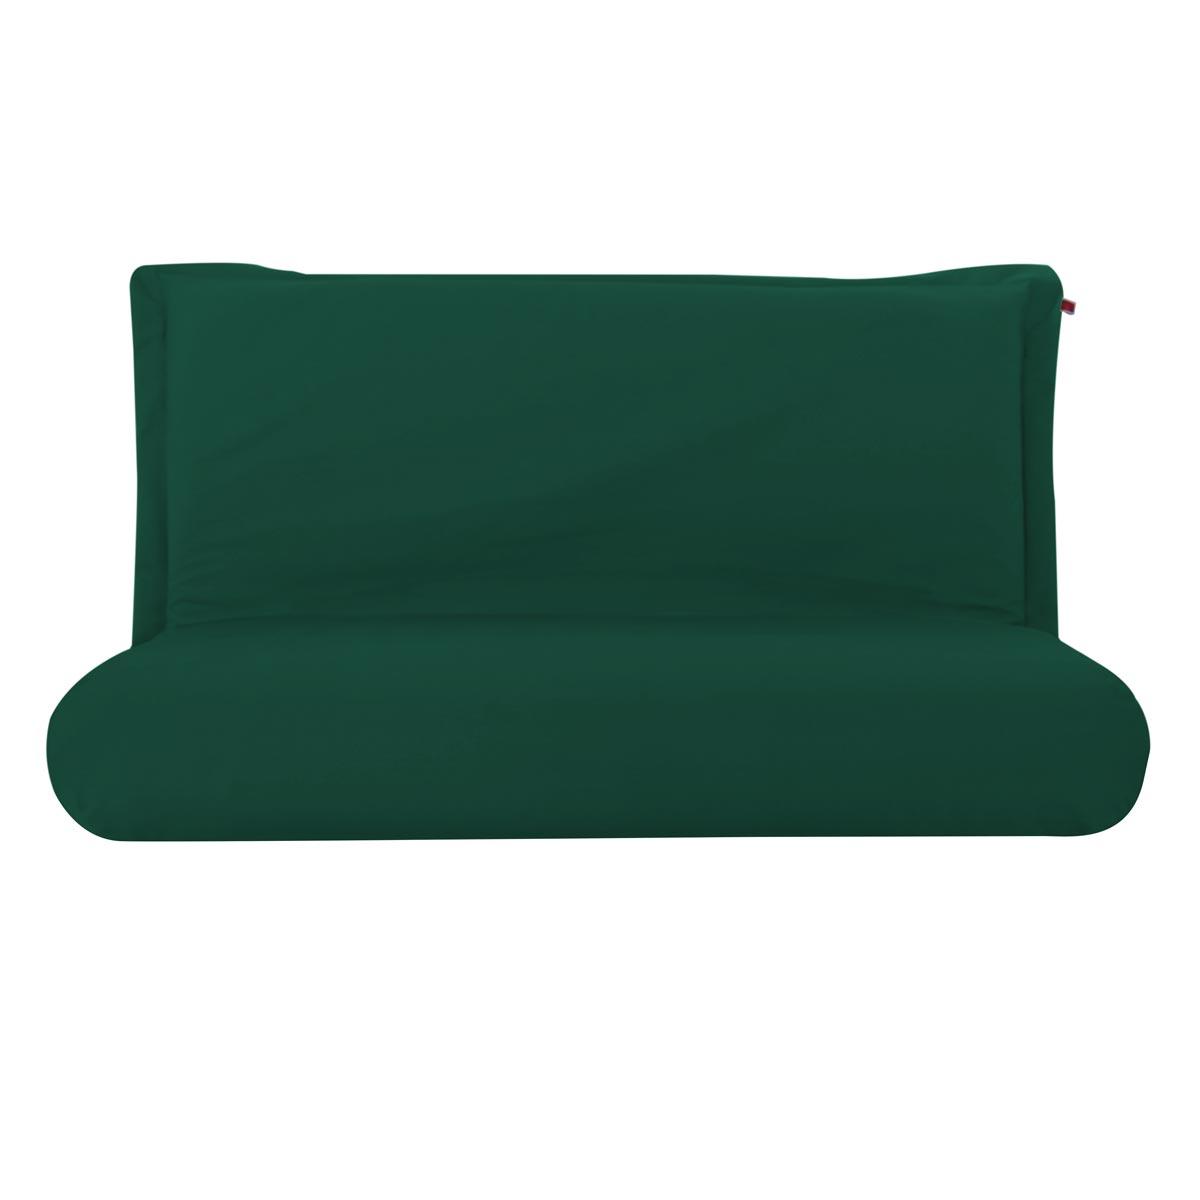 Pufe ClicClac Duo Lounge Tecido LN03 Bistro 01 03